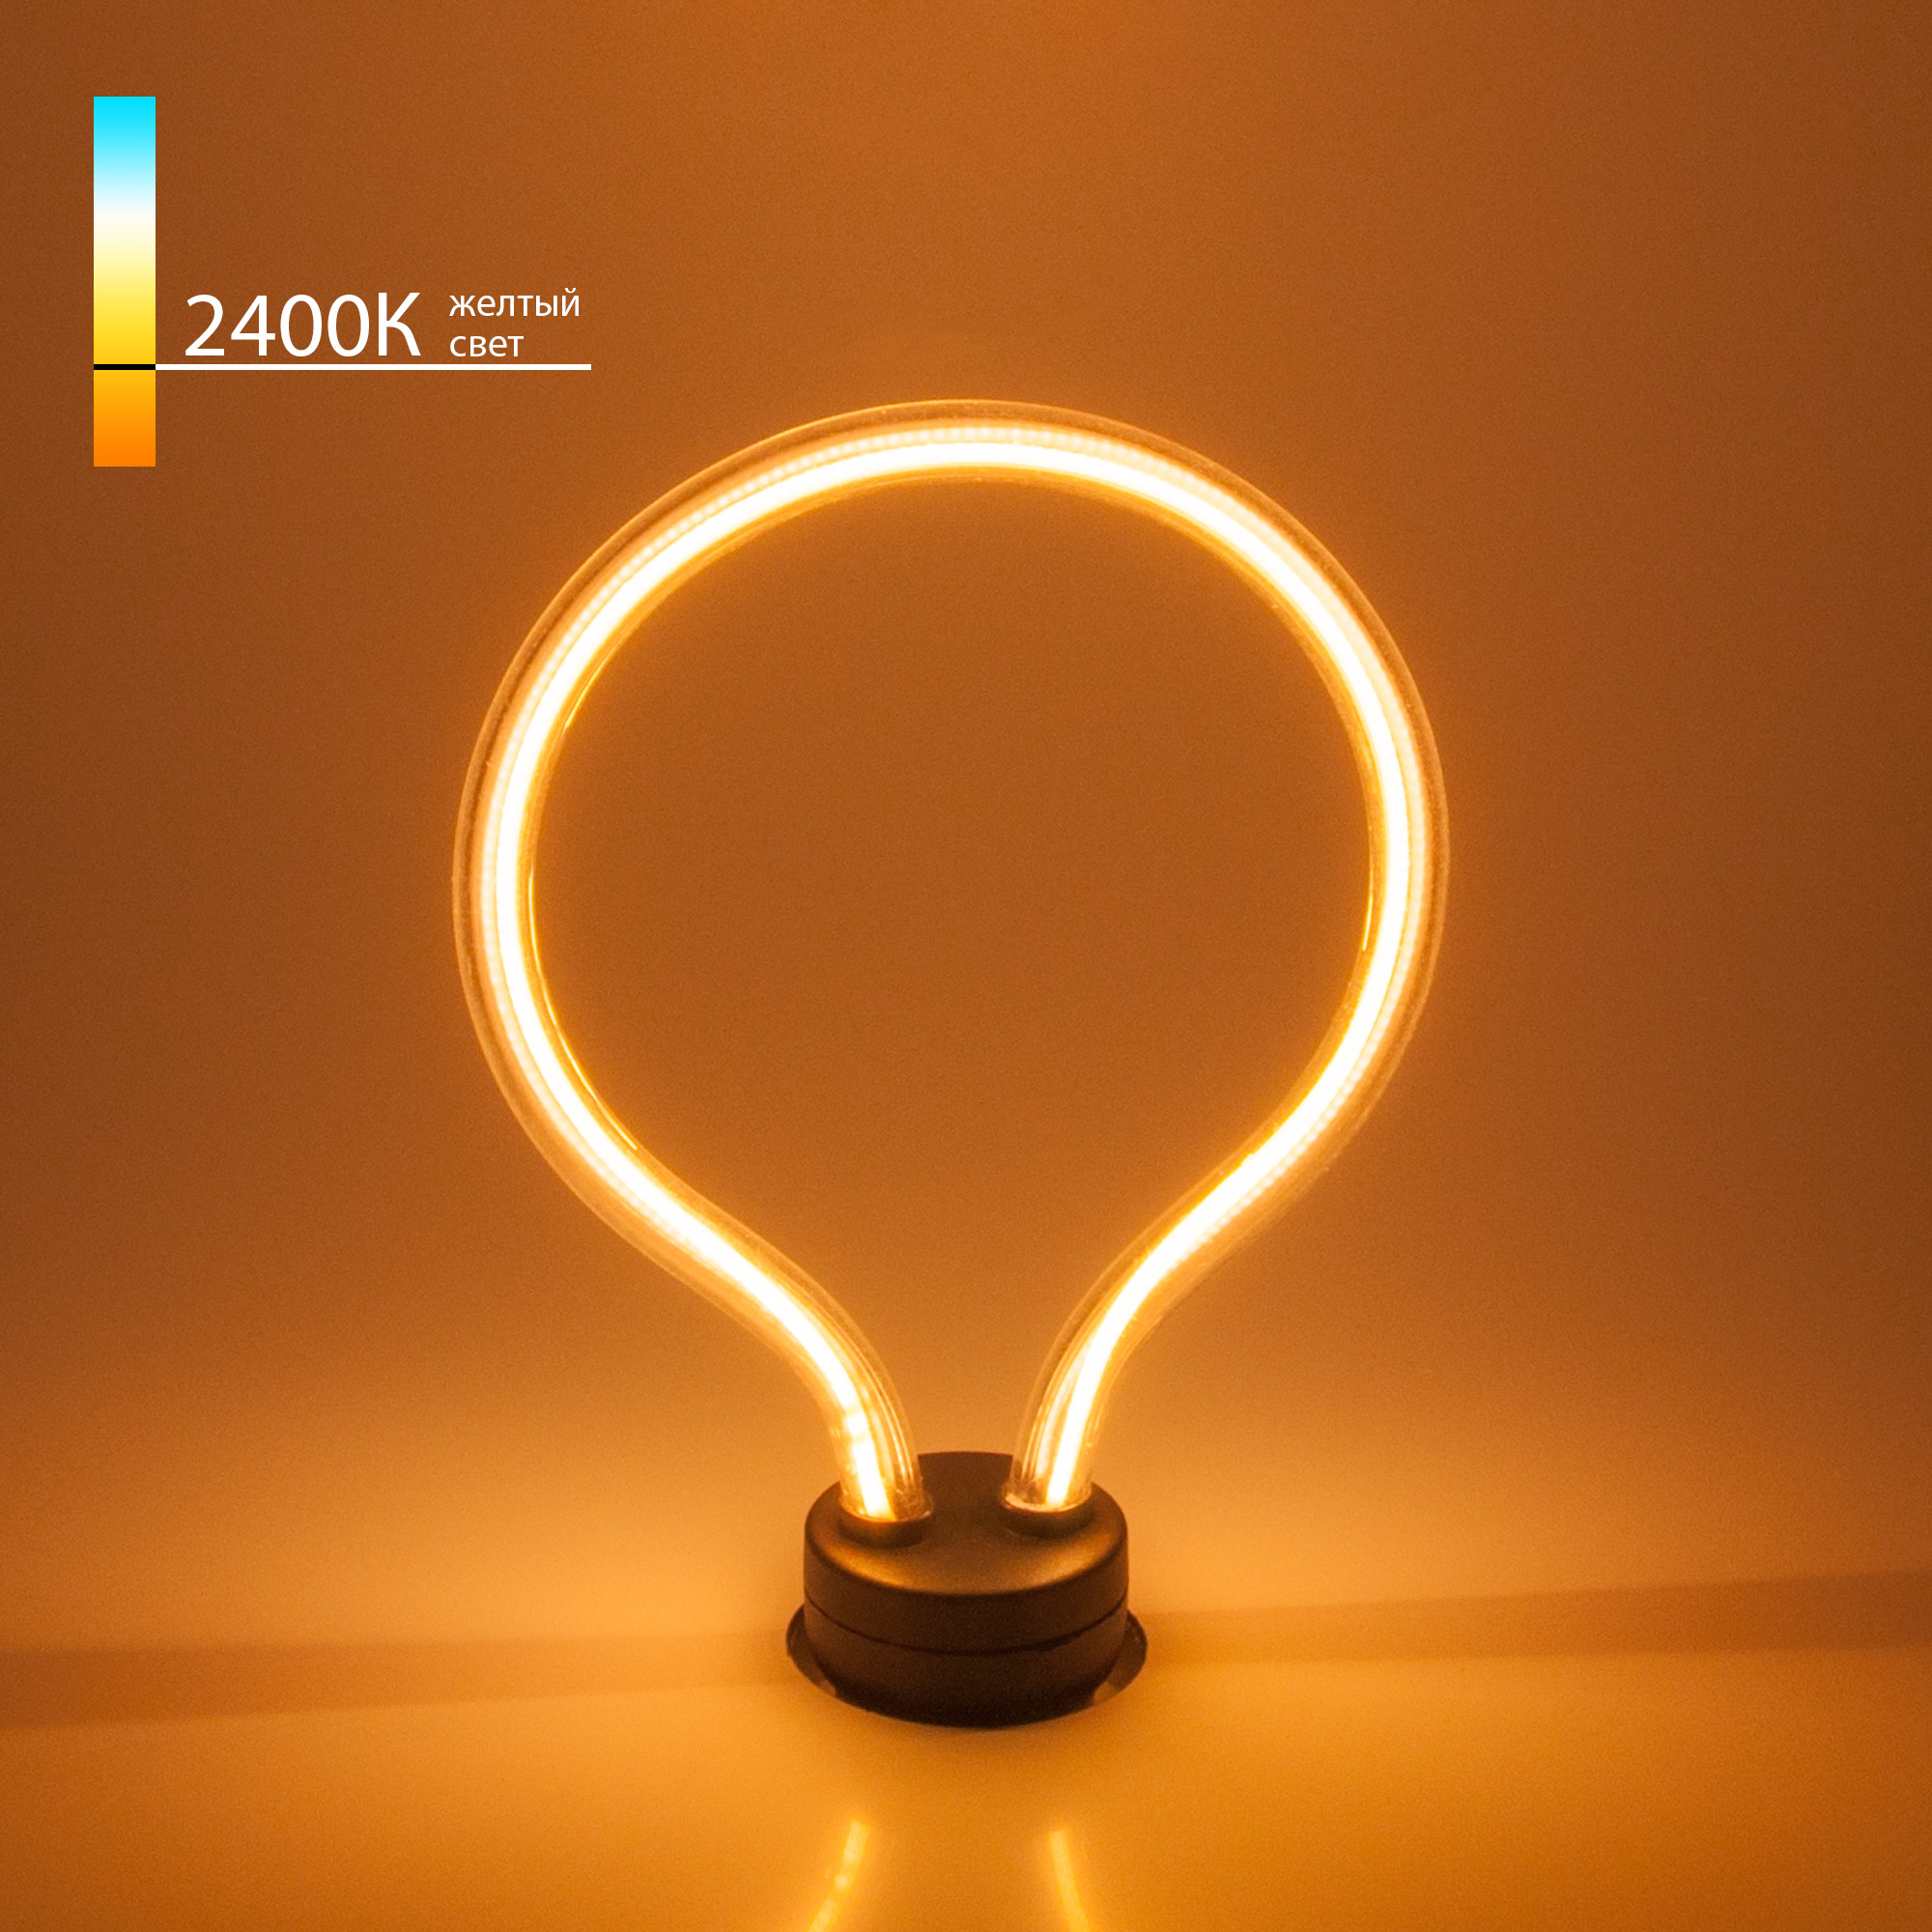 Филаментная светодиодная лампа Art filament 4W 2400K E27 BL150